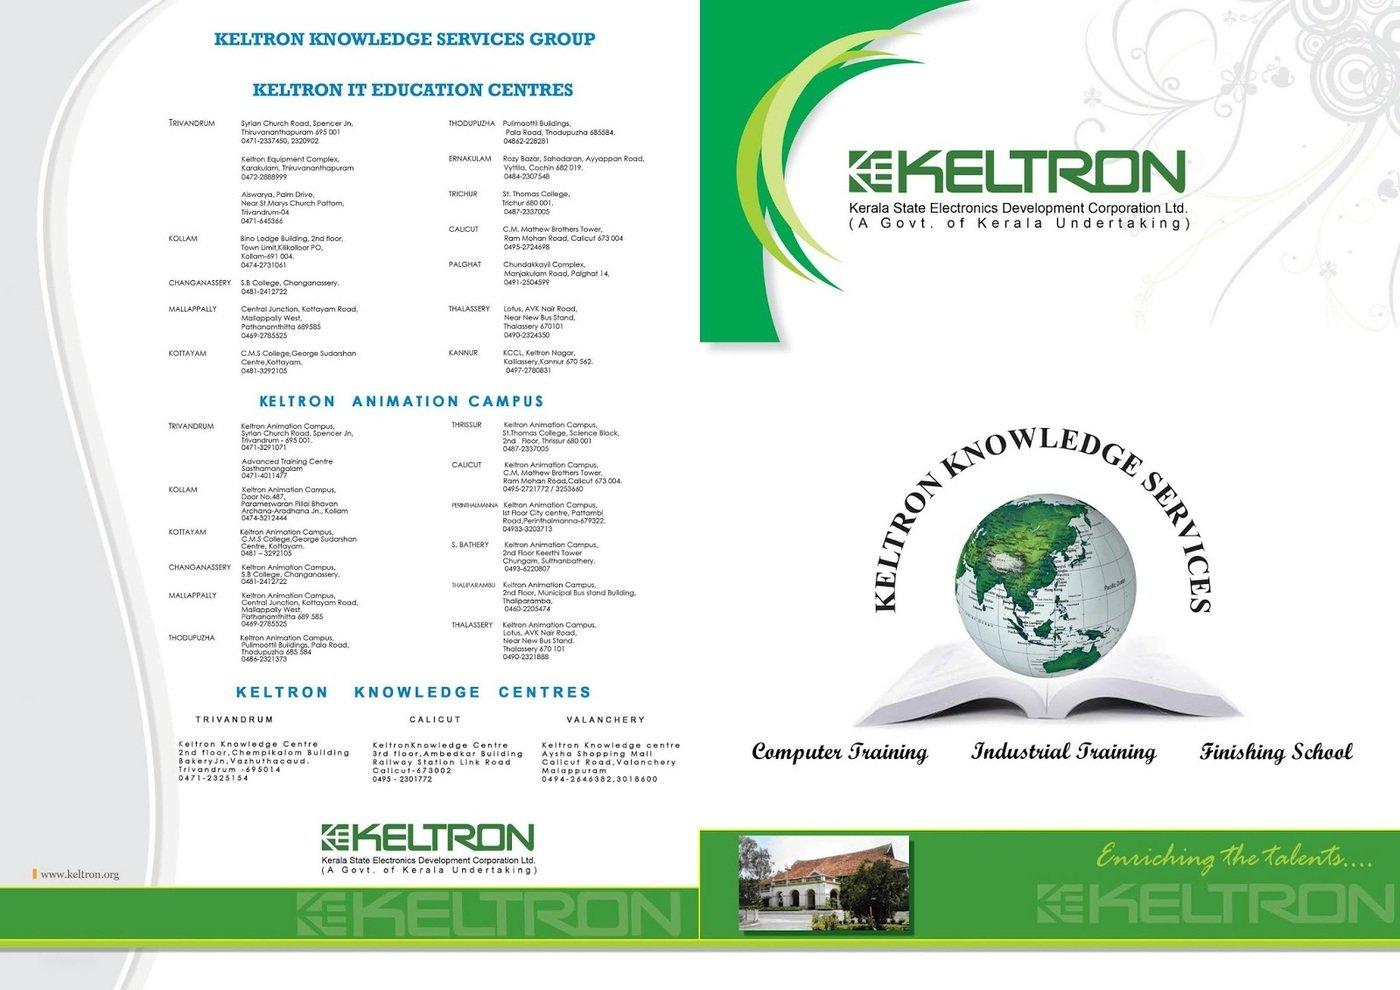 Keltron interior design courses in trivandrum interiorhalloween co for Interior design certification colorado